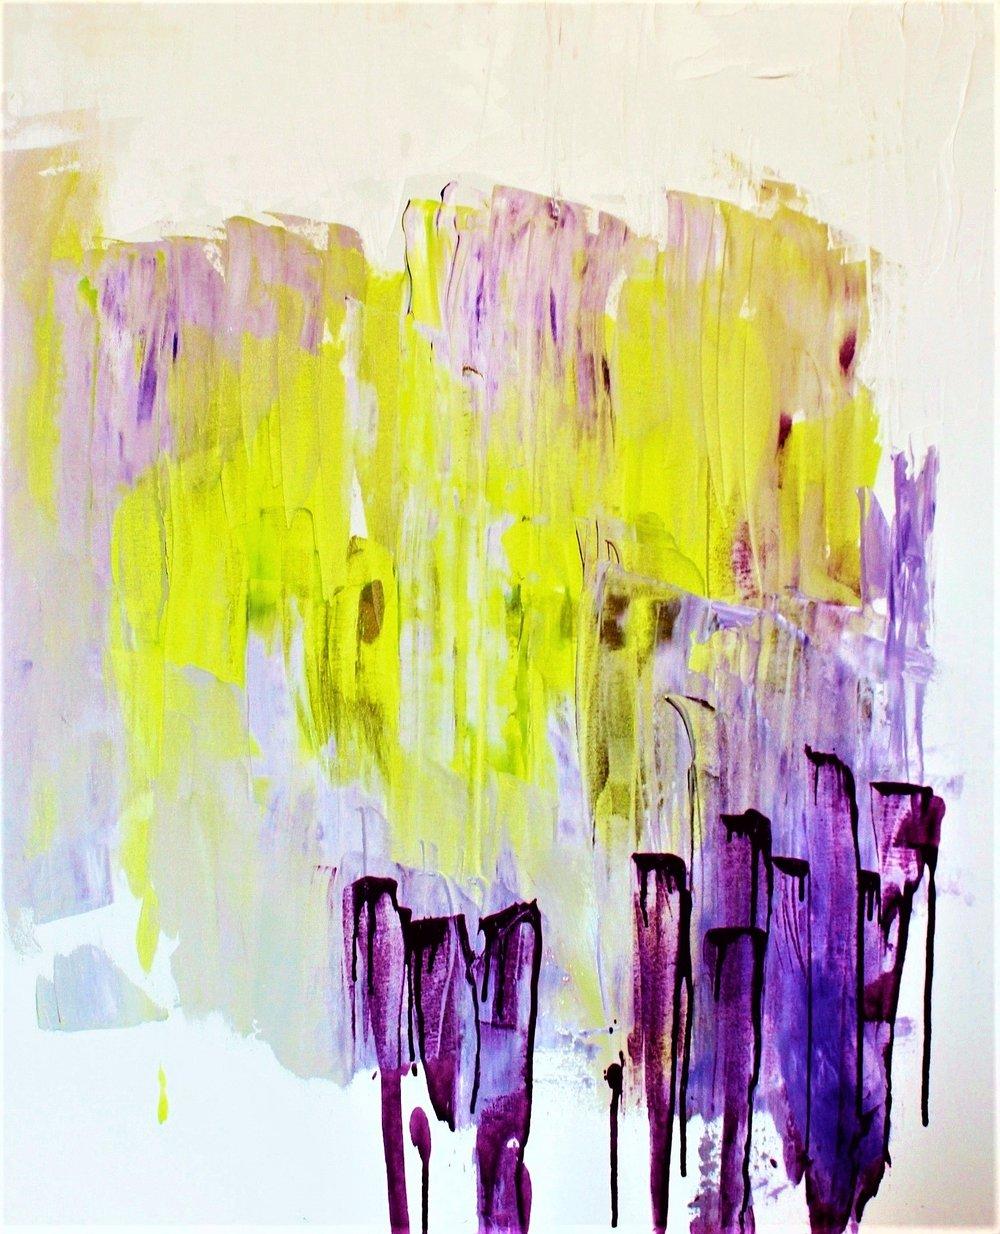 Kirkkaat ajat, Akryyli kankaalle, 81 cm x 100 cm  Myyty / Sold